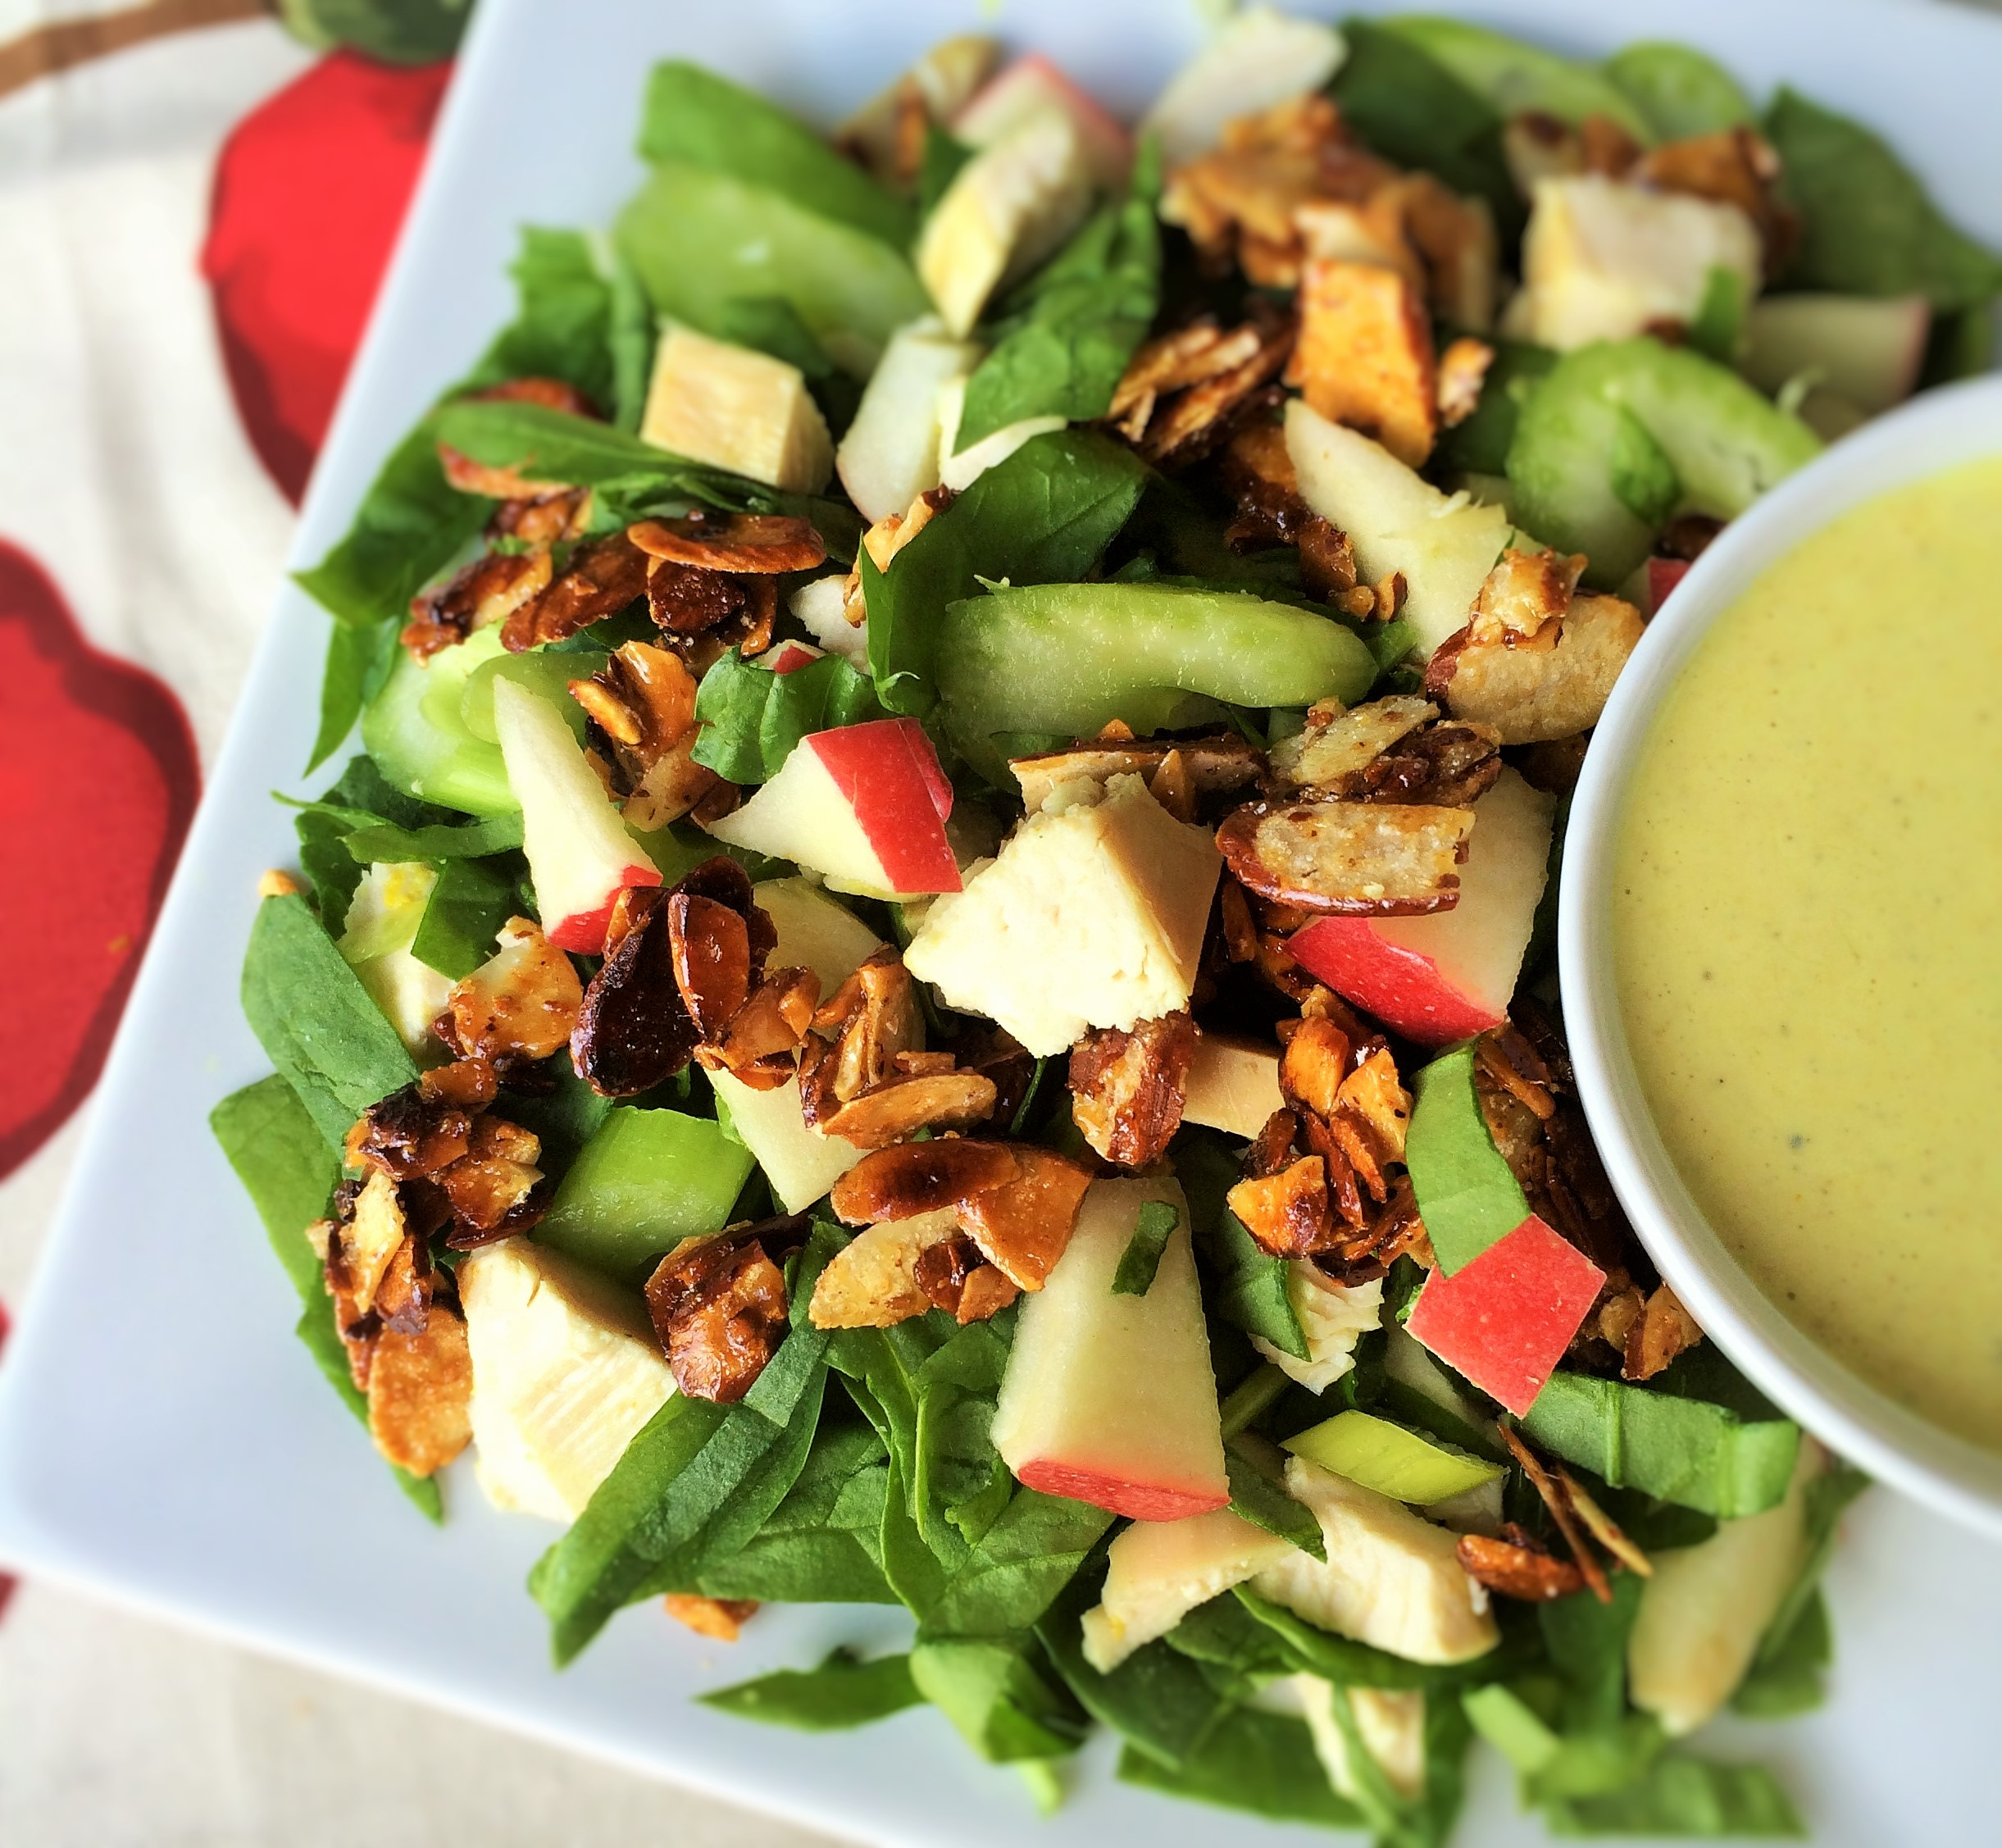 Roasted Artichoke And White Bean Salad With Lemon Basil